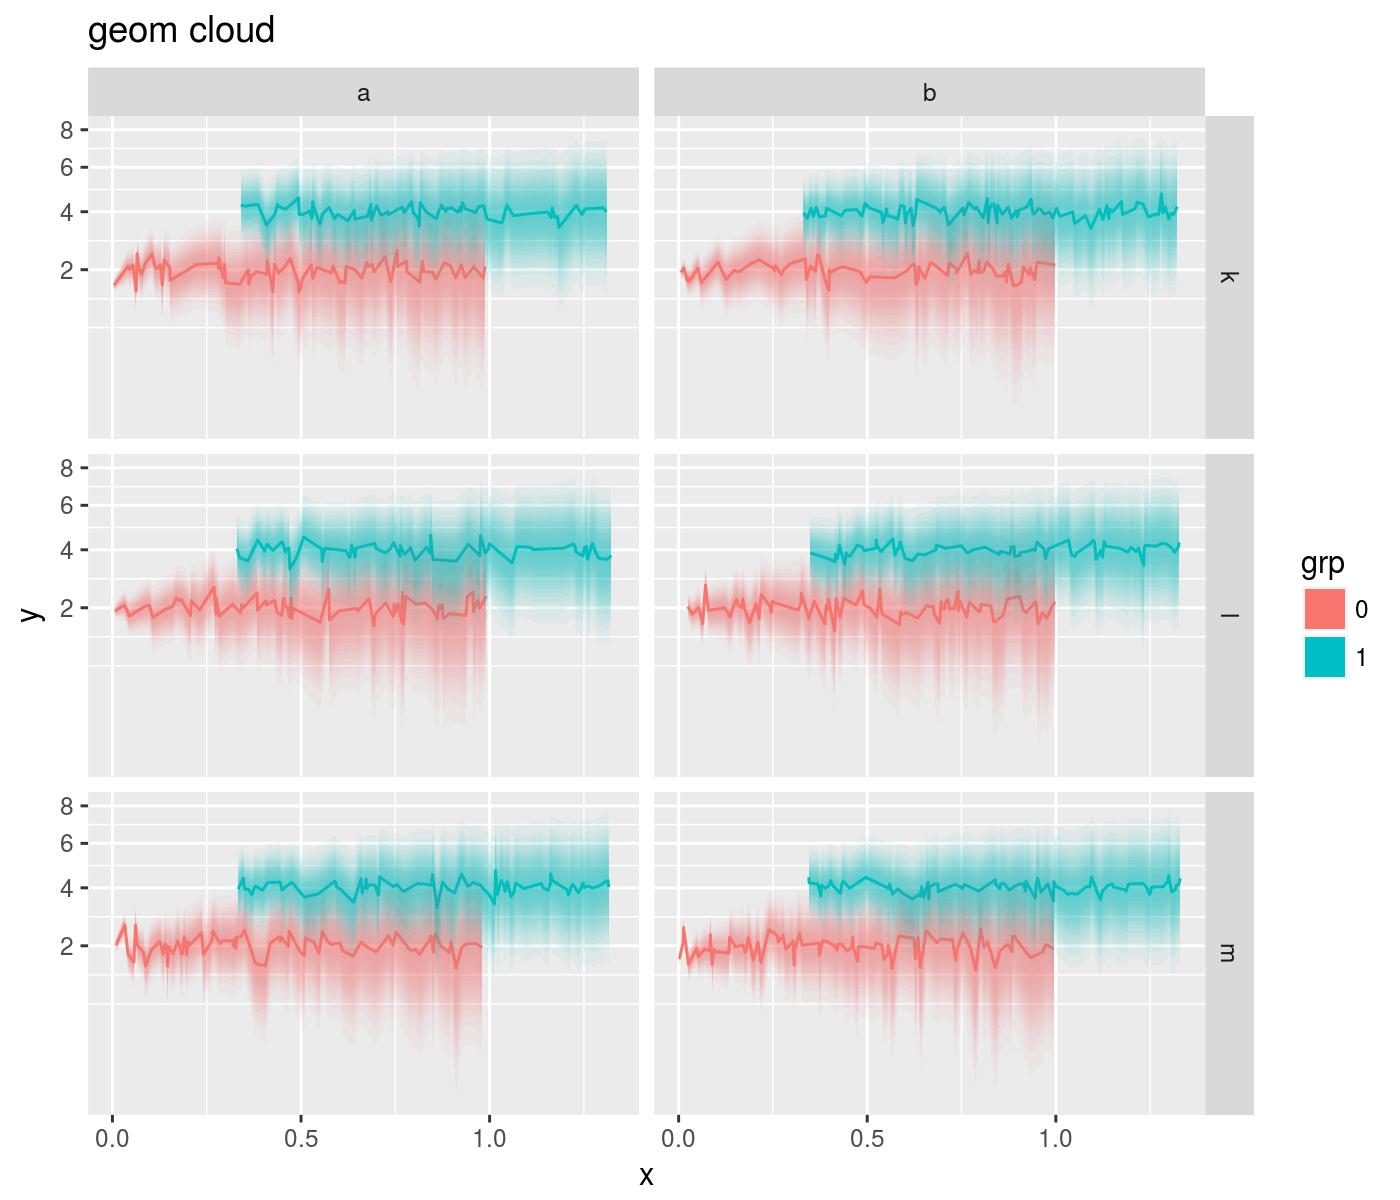 plot of chunk geom_cloud